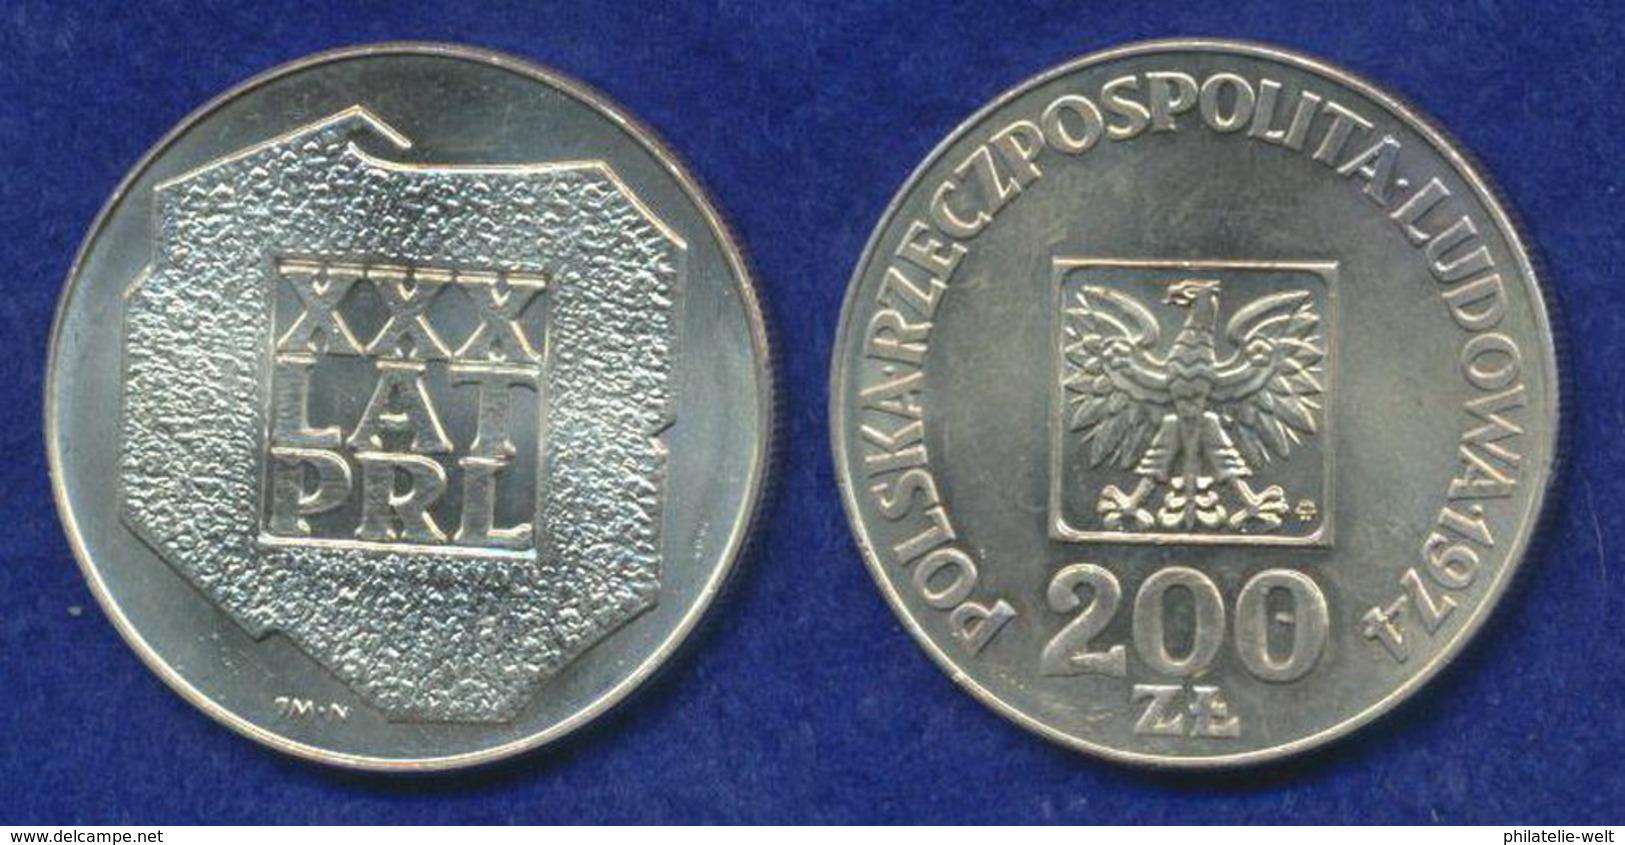 Polen 200 Zl. 1974 Landkarte Und Inschrift Ag625 14,5g - Pologne